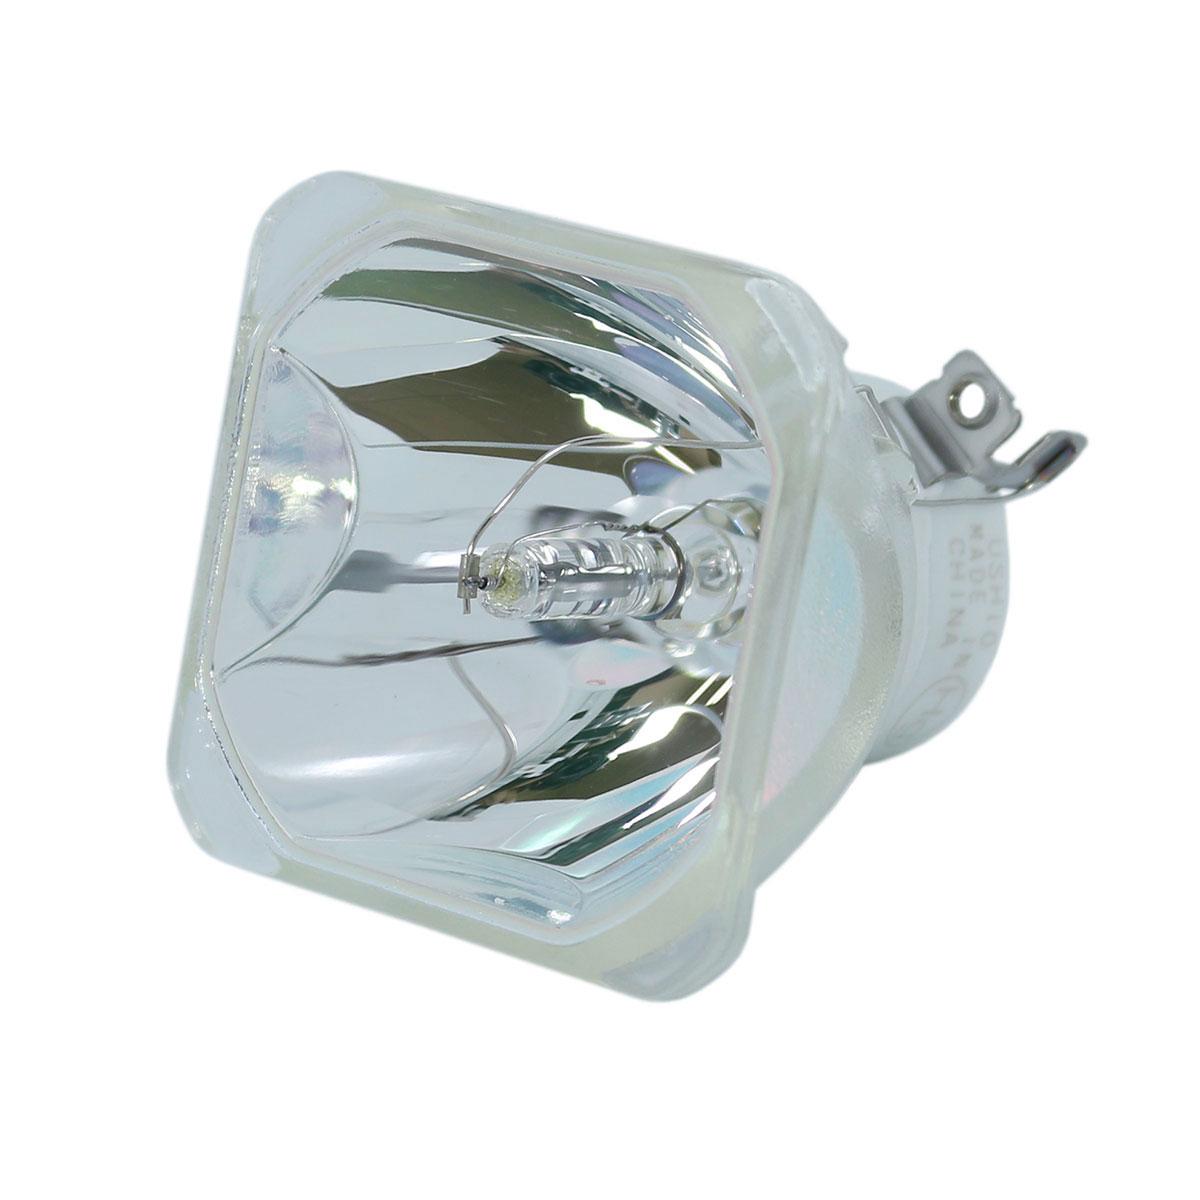 ET-LAL100 ETLAL100 for Panasonic PT-LW25H PT-LX26 PT-LX26EA PT-LX30H PT-LX22 PT-LX26HEA PT-LW25HEA Projector Lamp Bulb Without/H аквабокс meikon lx 100 для panasonic lx 100